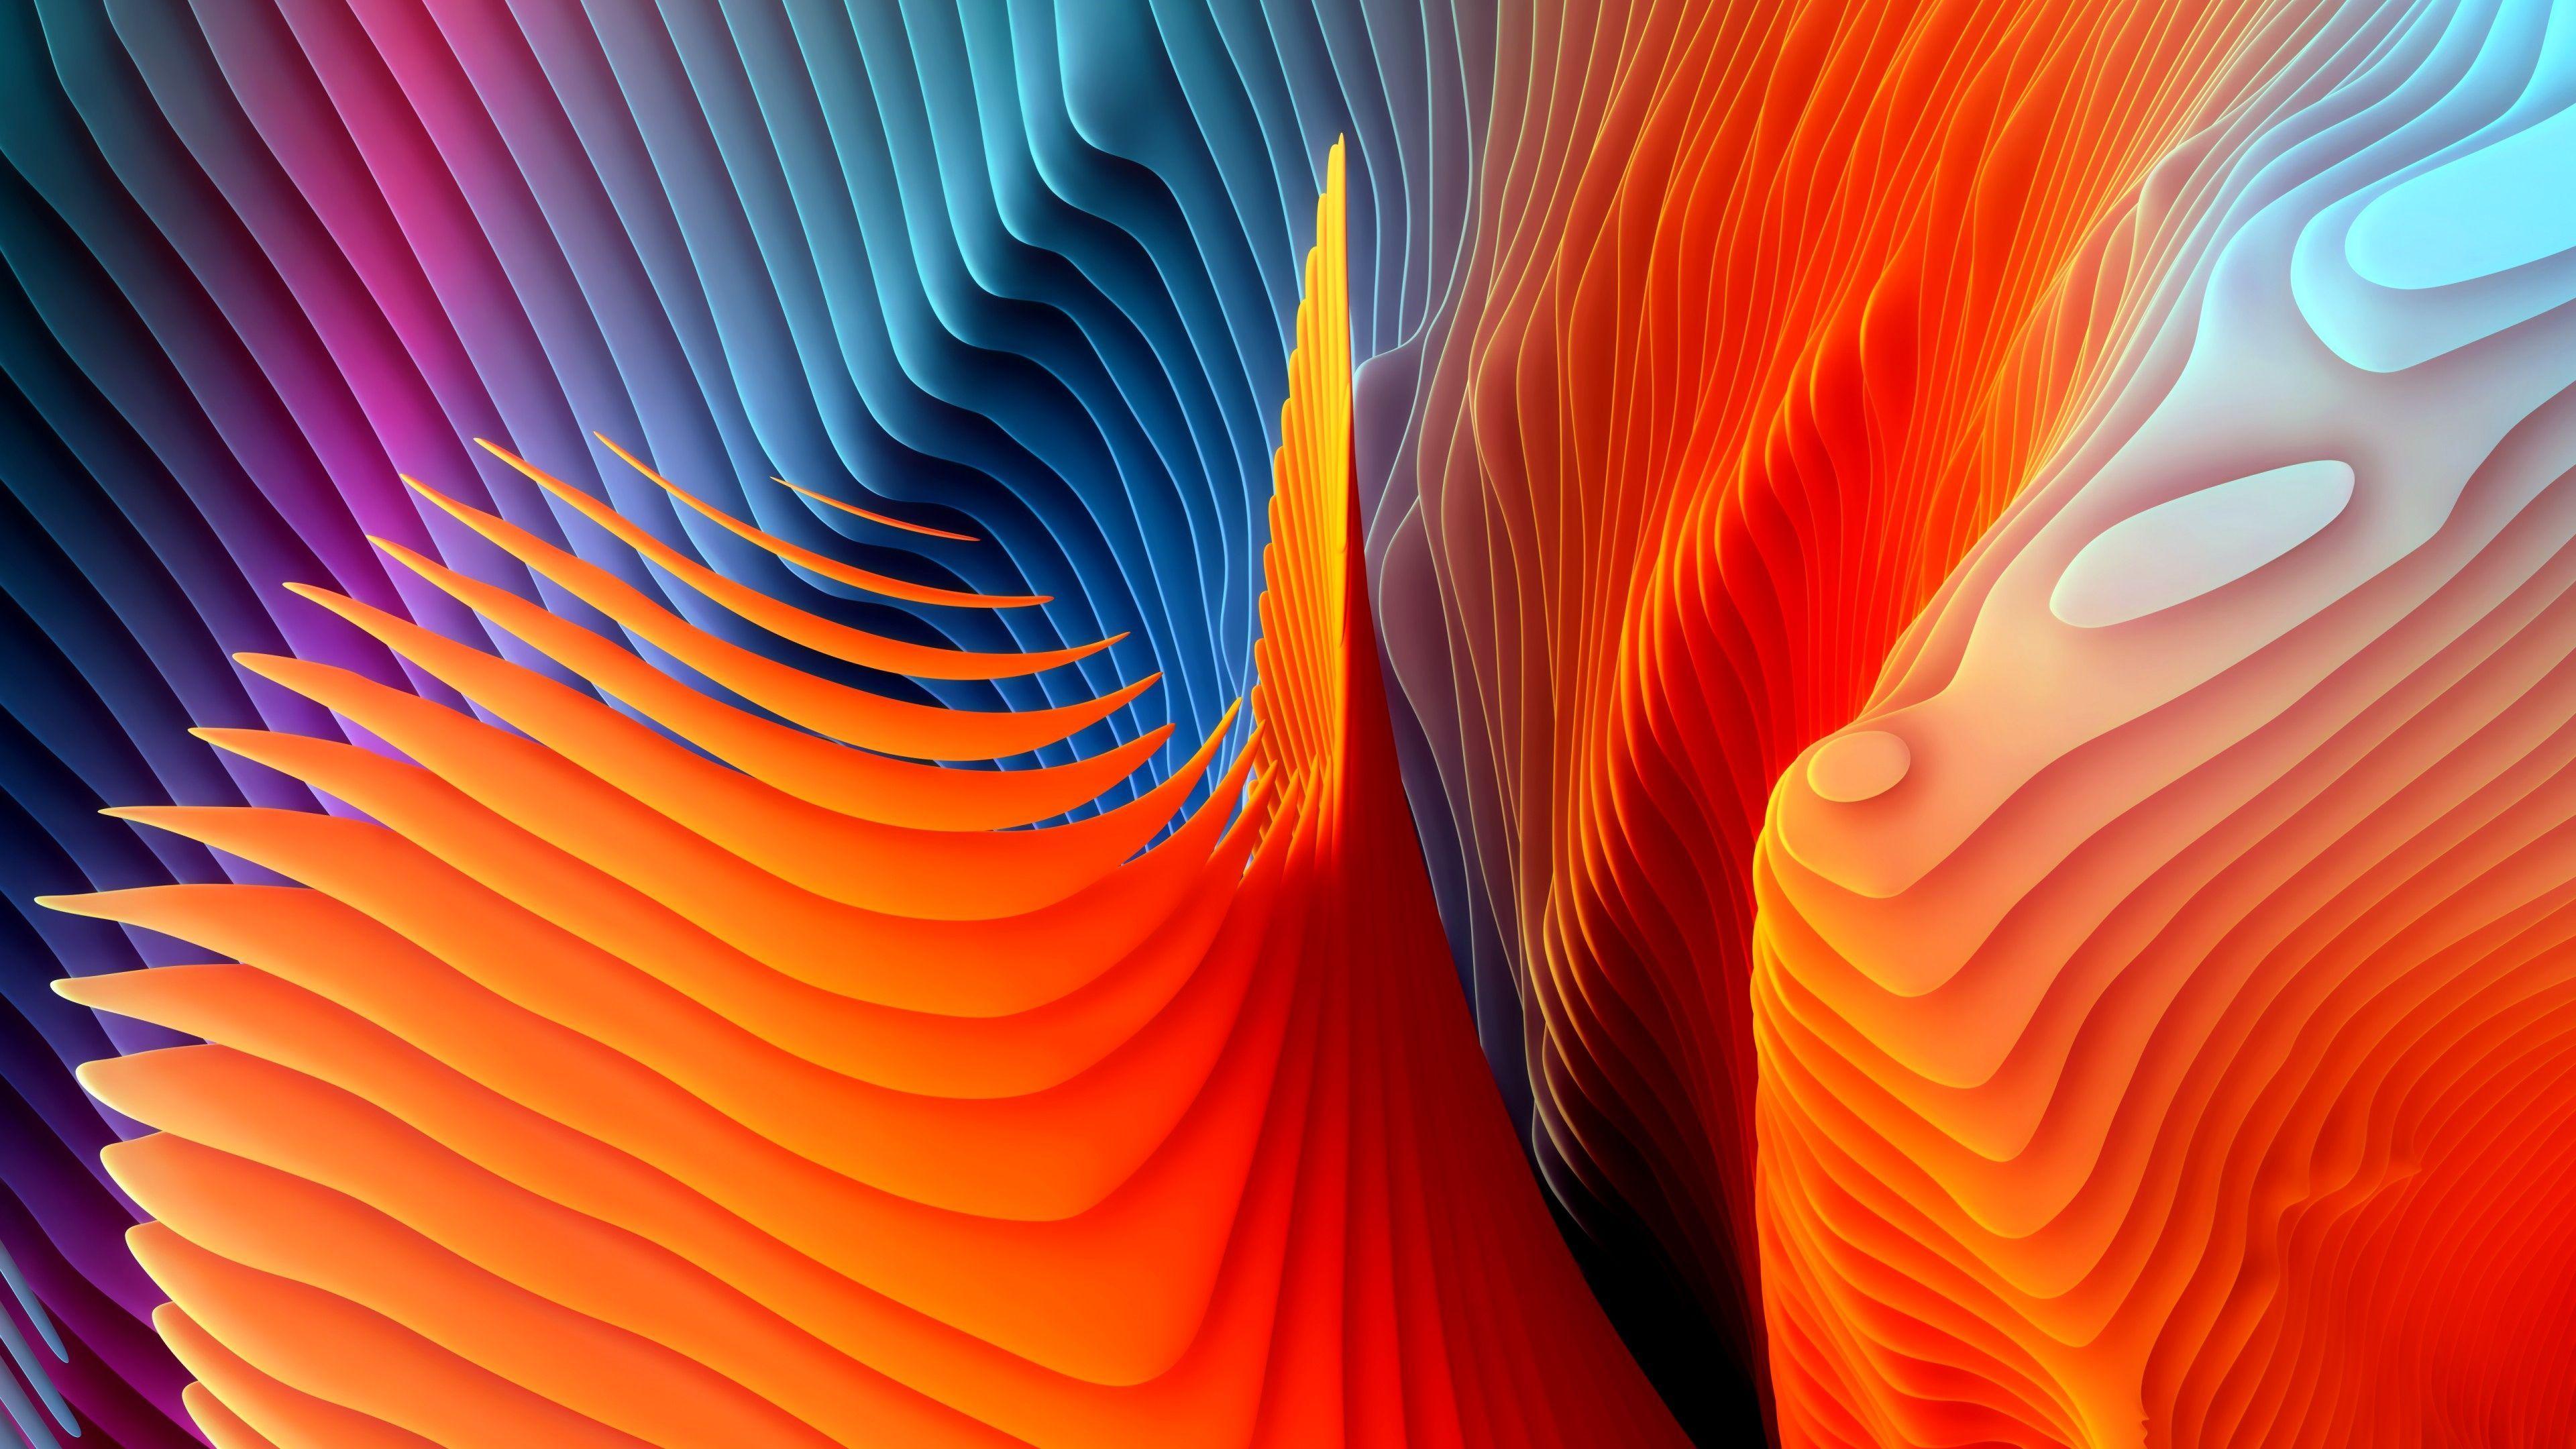 Mac Os Wallpaper 4k Pack Gallery Fondecrannoel In 2020 Os